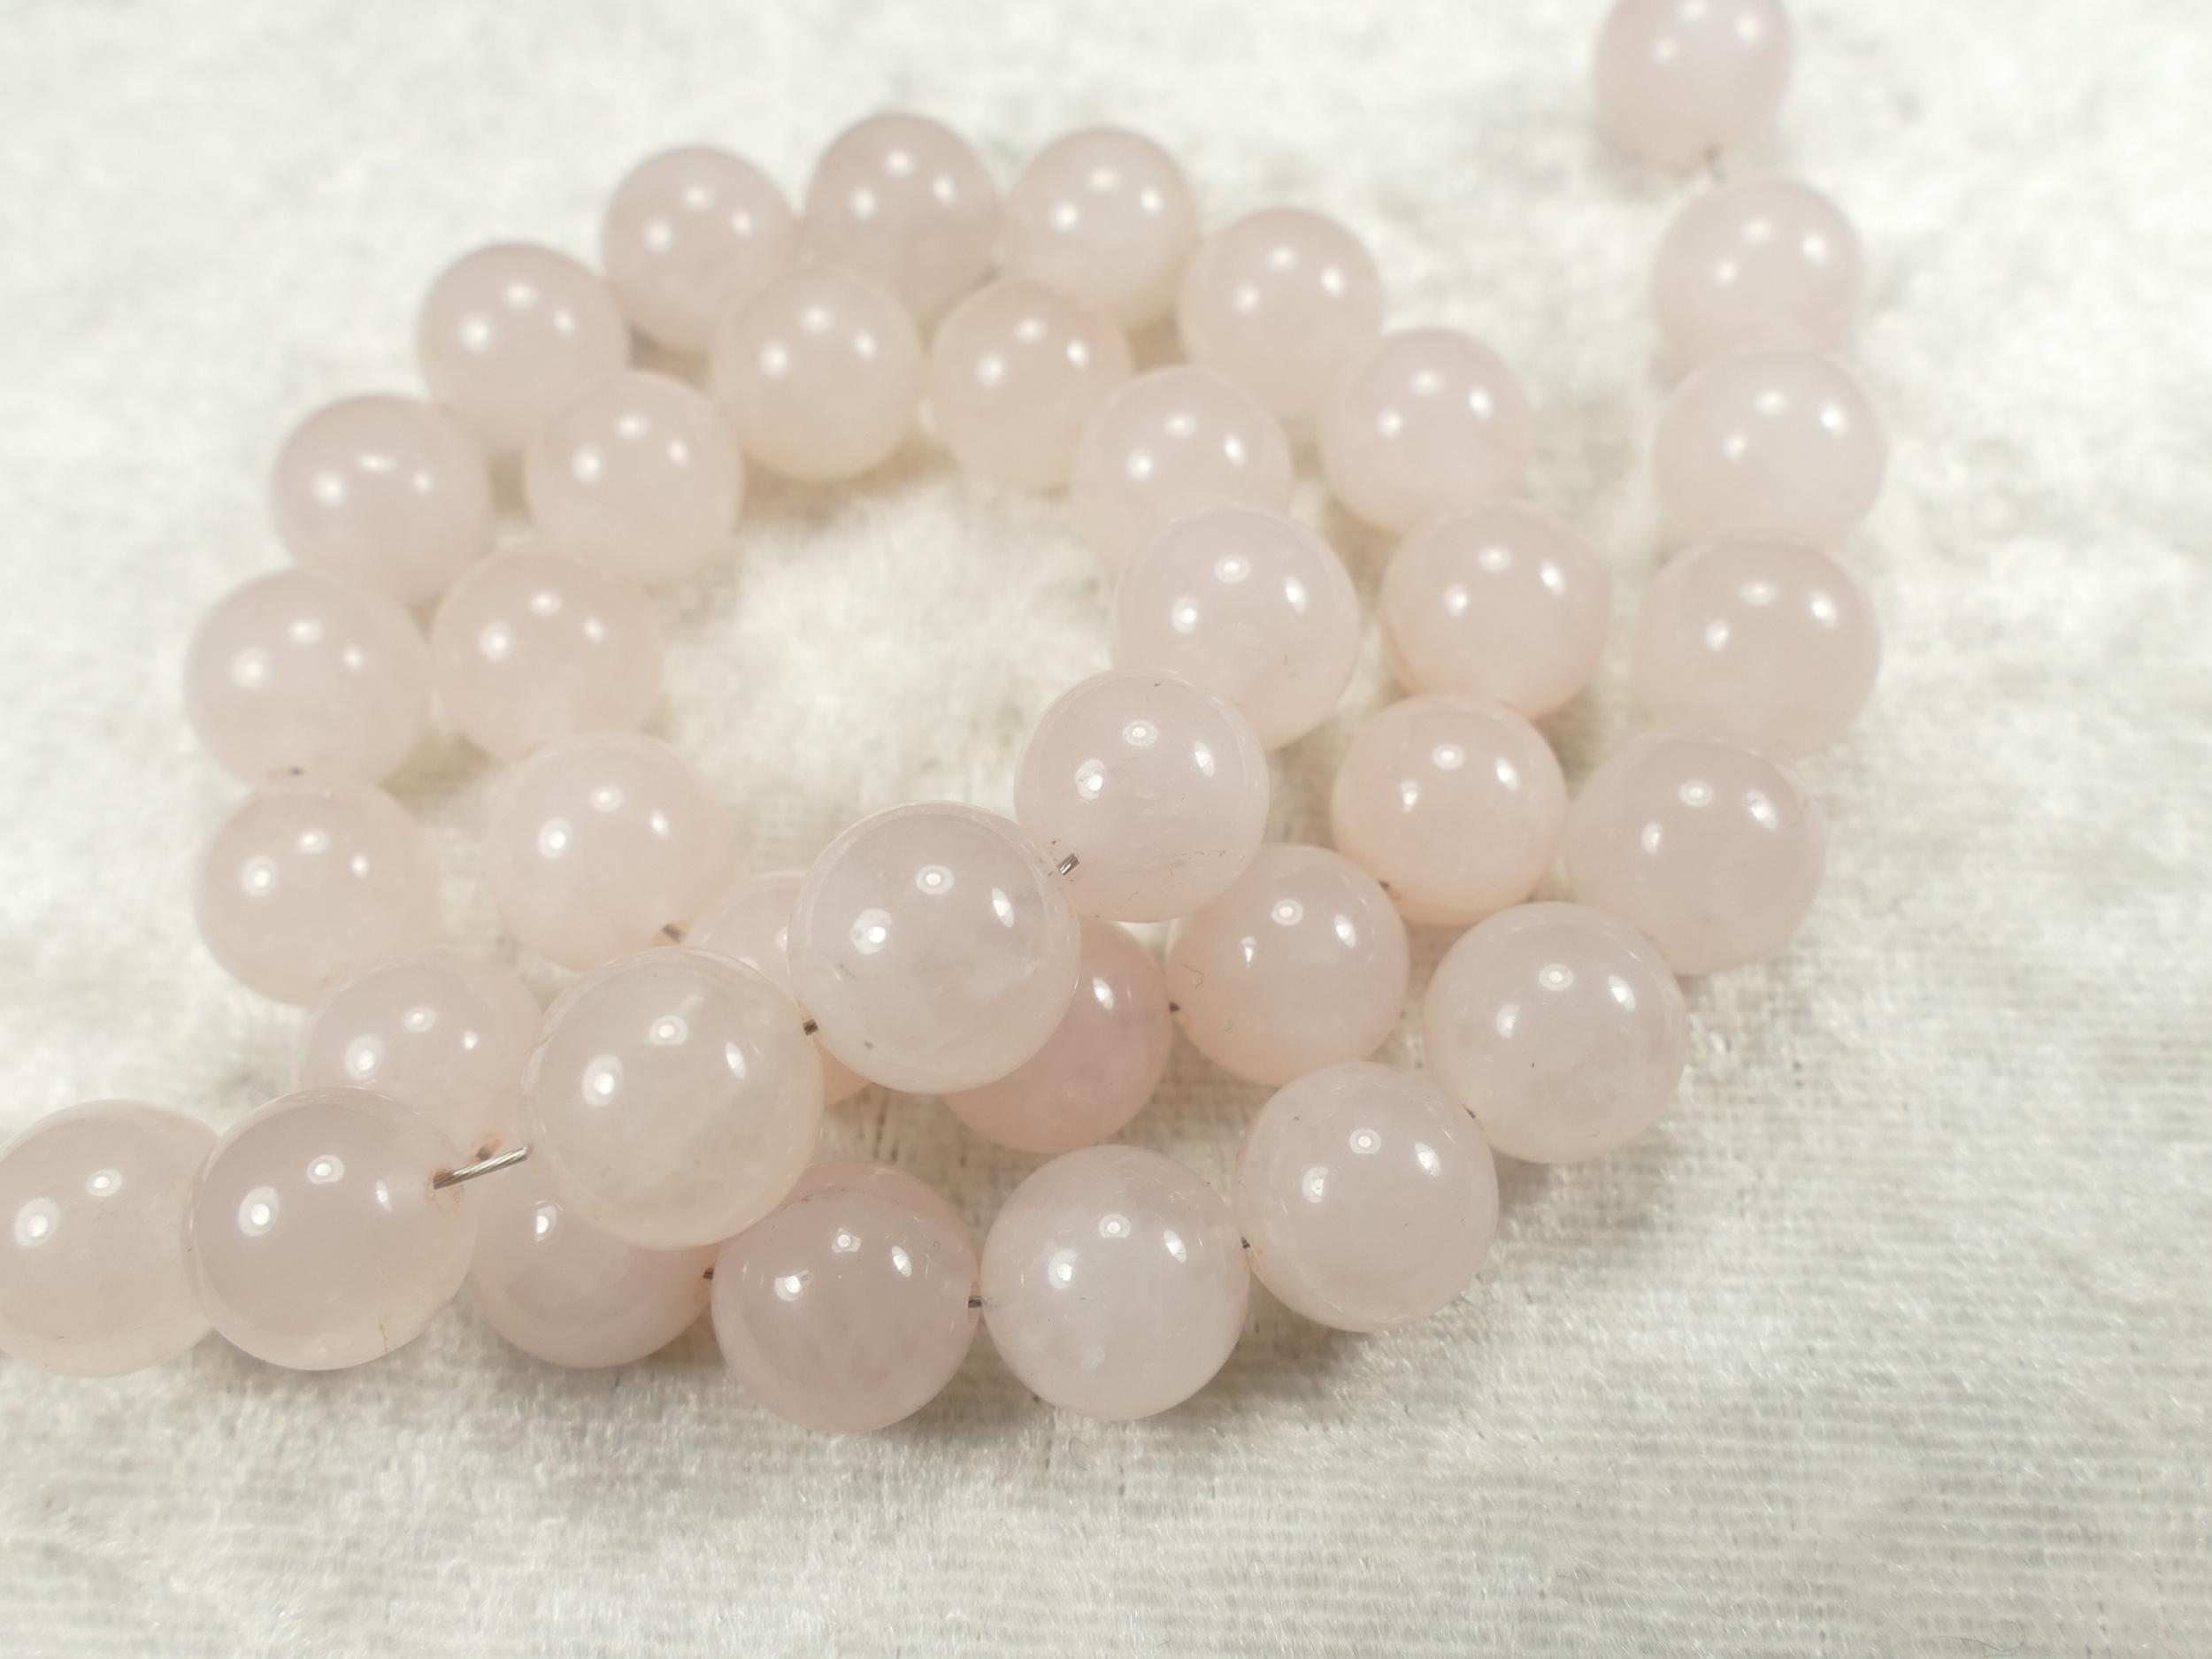 9.7/10.3mm x16 Perles de Quartz rose naturelle boule / ronde lisse (#AC643)